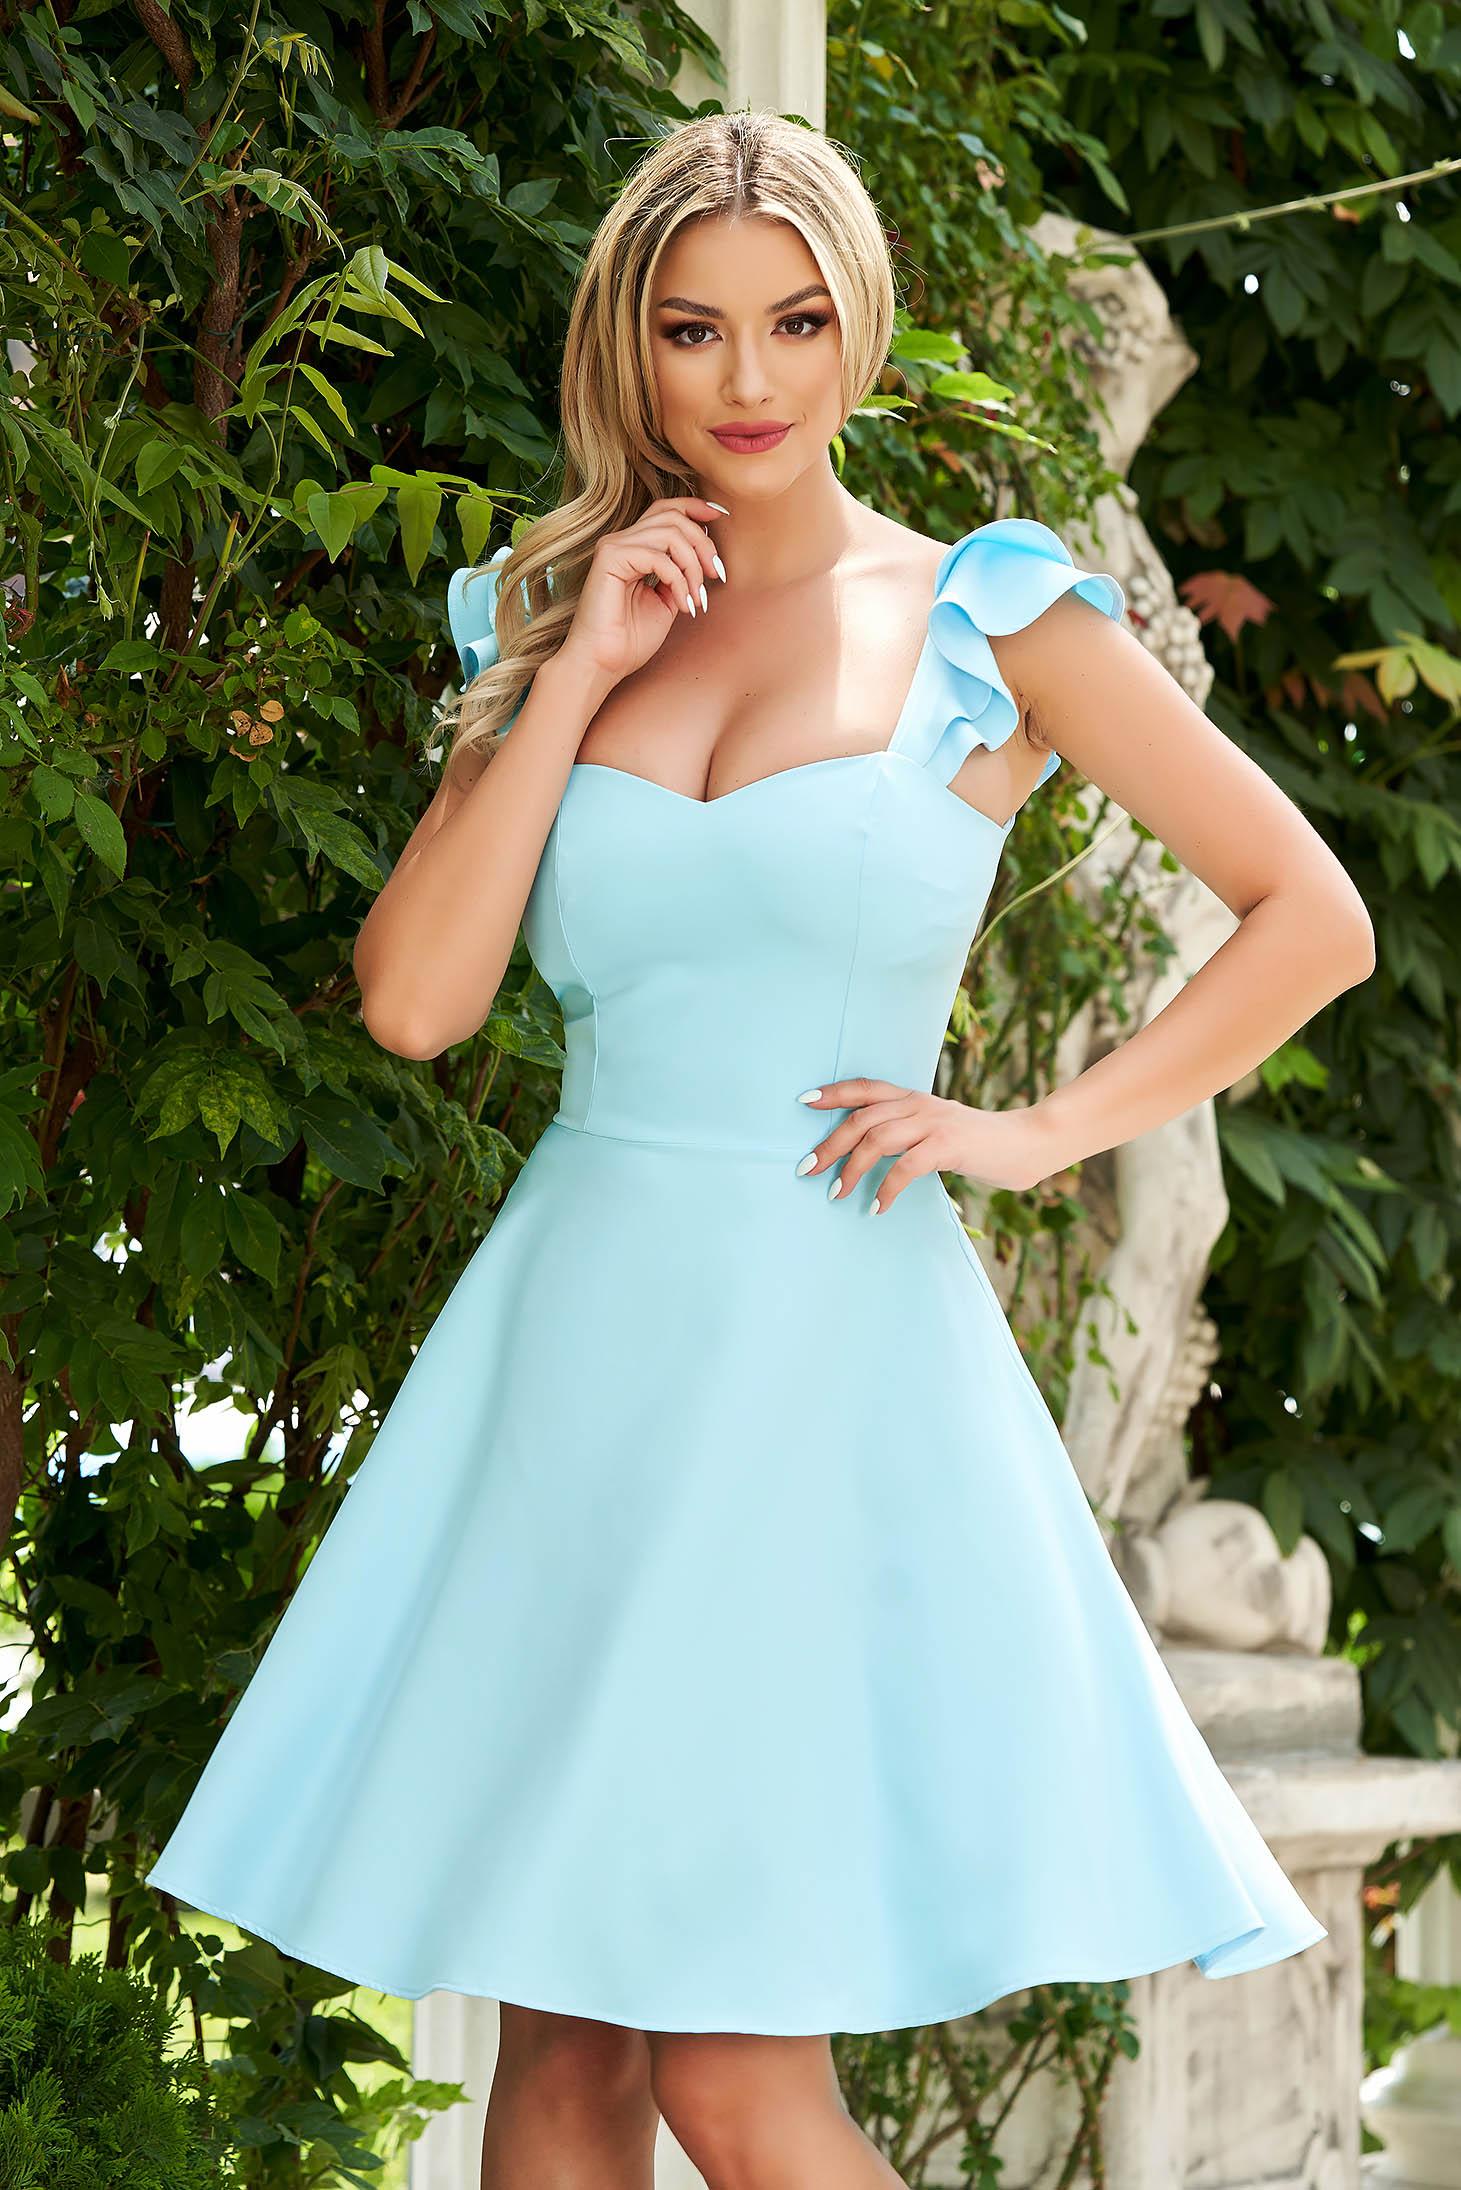 Rochie StarShinerS albastru-deschis eleganta scurta din stofa subtire cu volanase